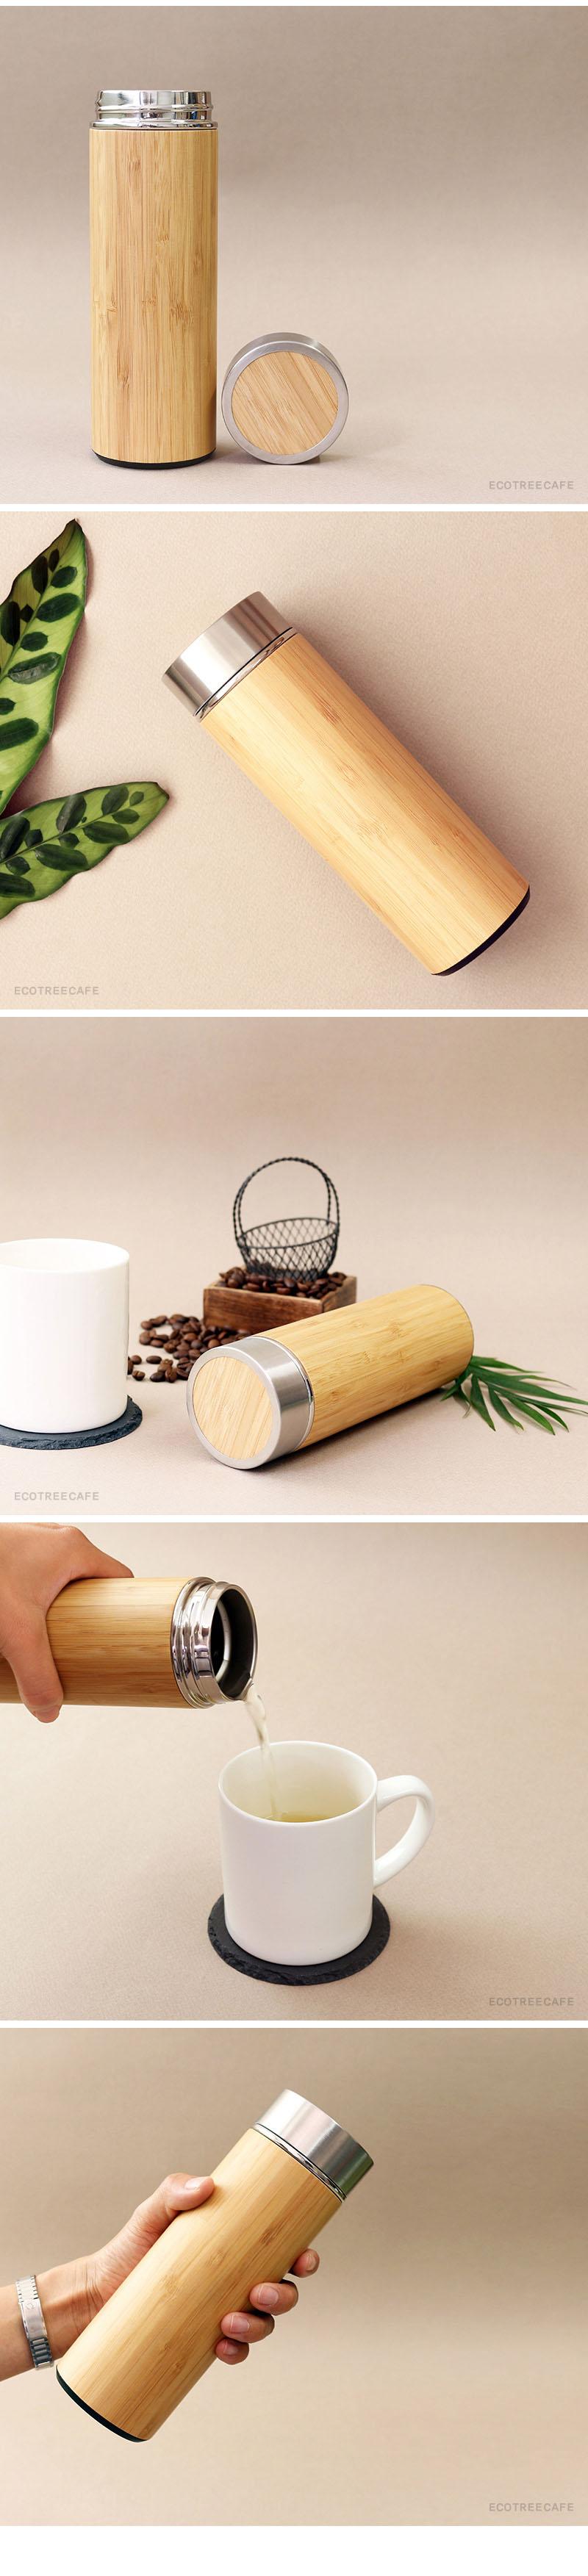 bamboo_04.jpg